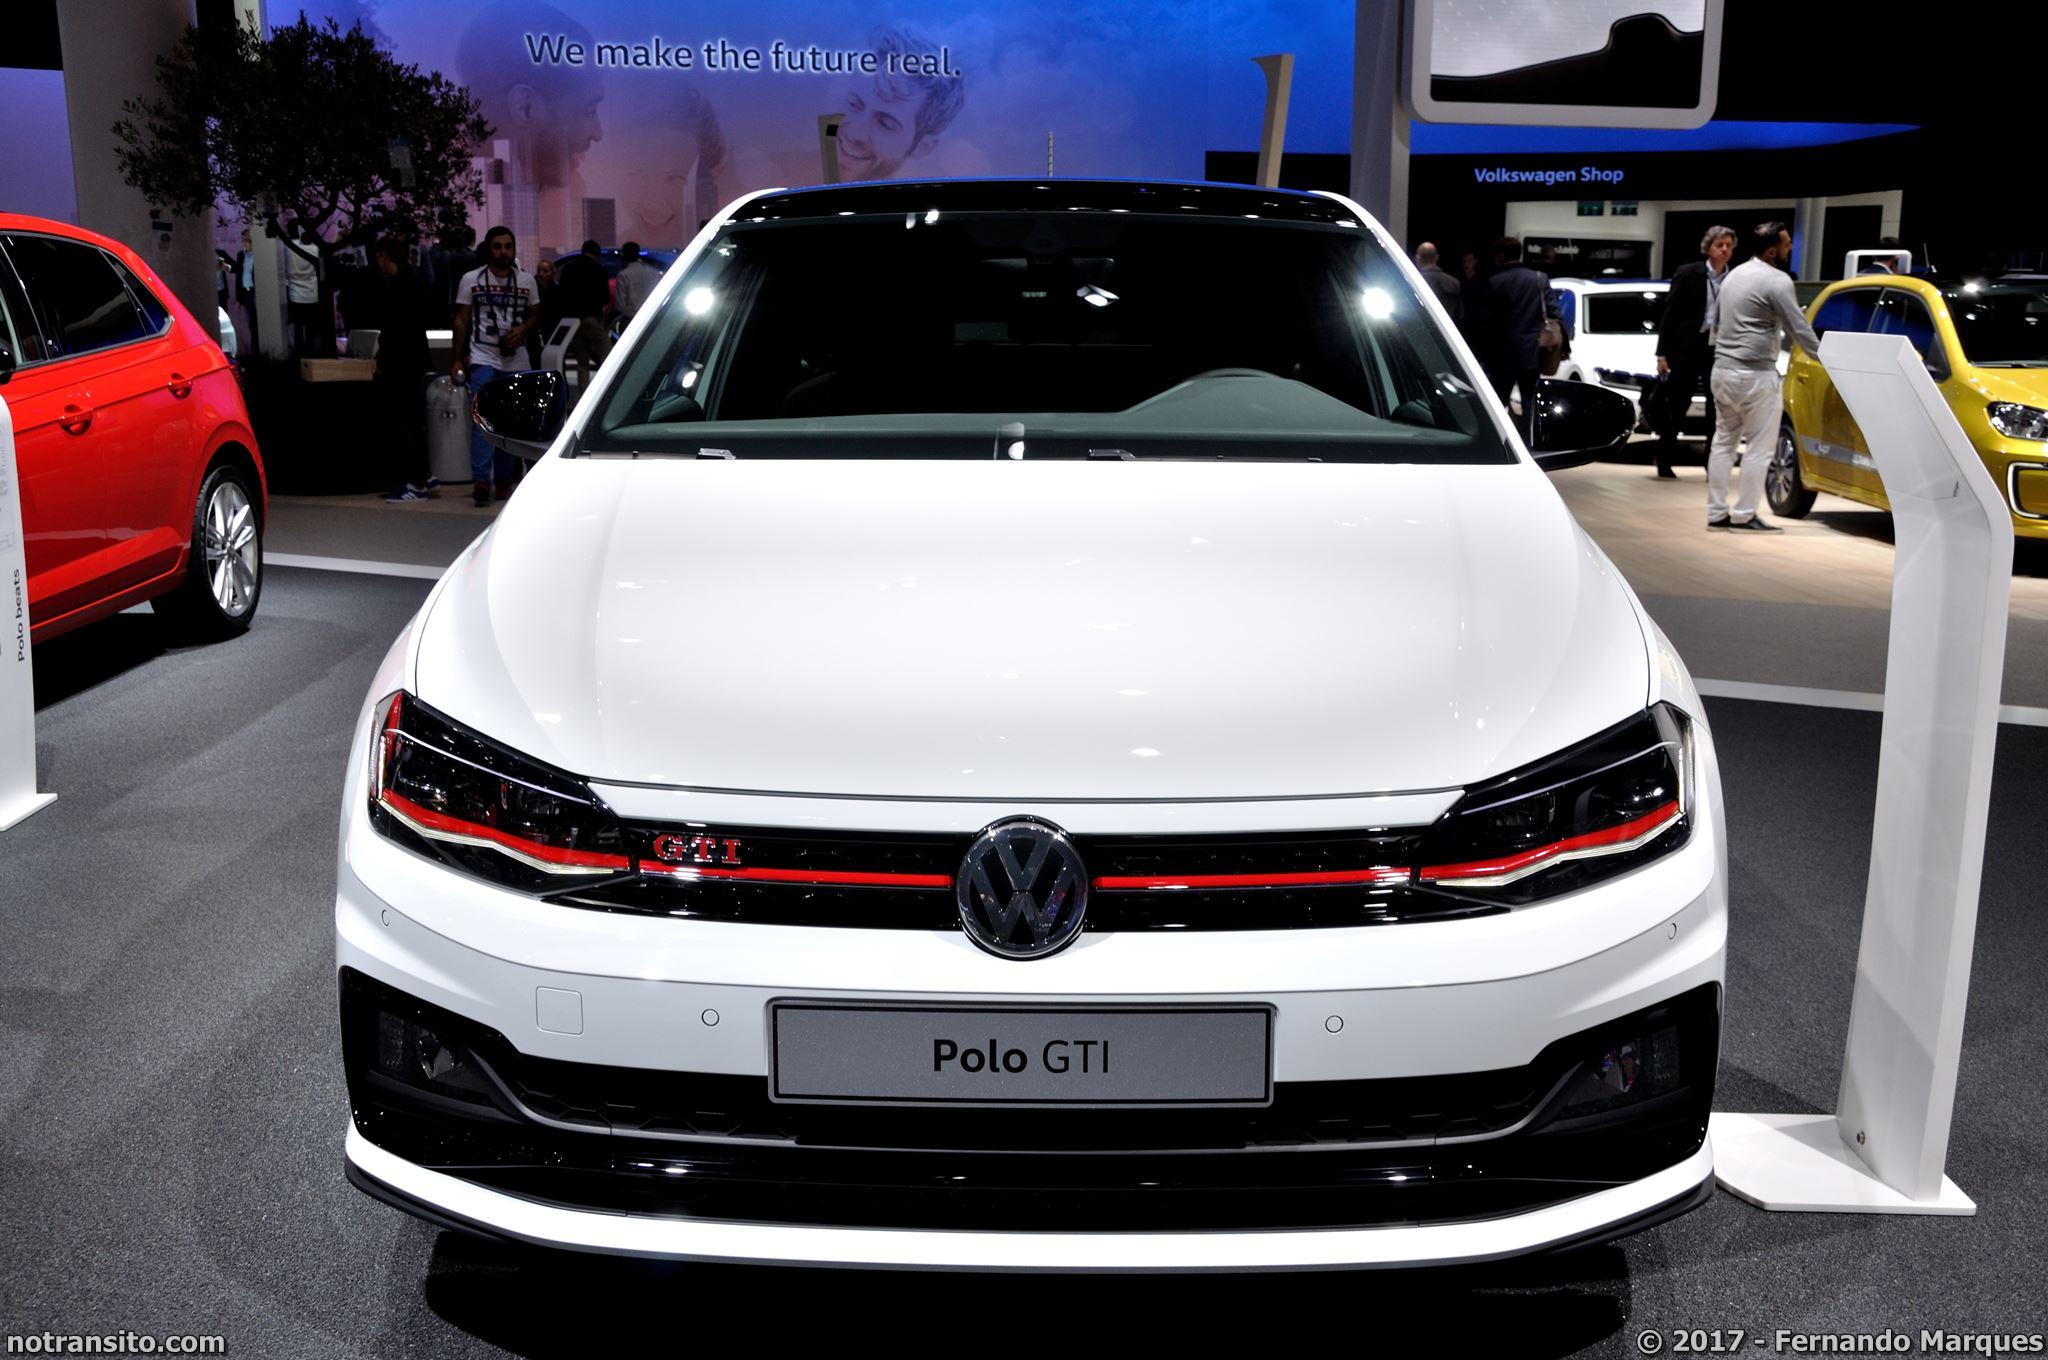 Volkswagen-Polo-GTI-Frankfurt-2017-003